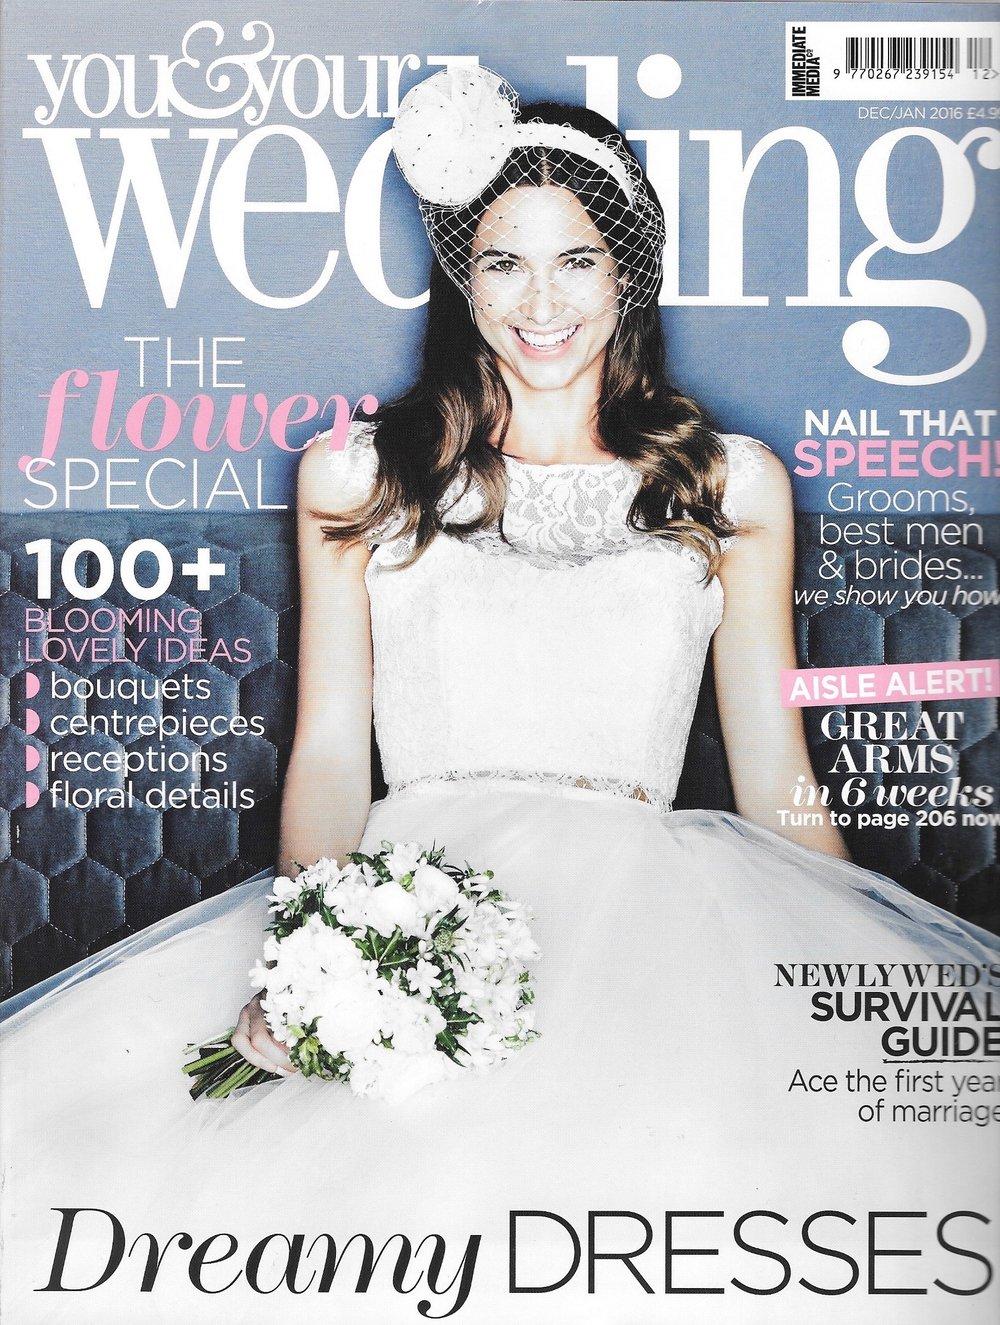 You & Your Wedding Magazine, Dec/Jan 2016